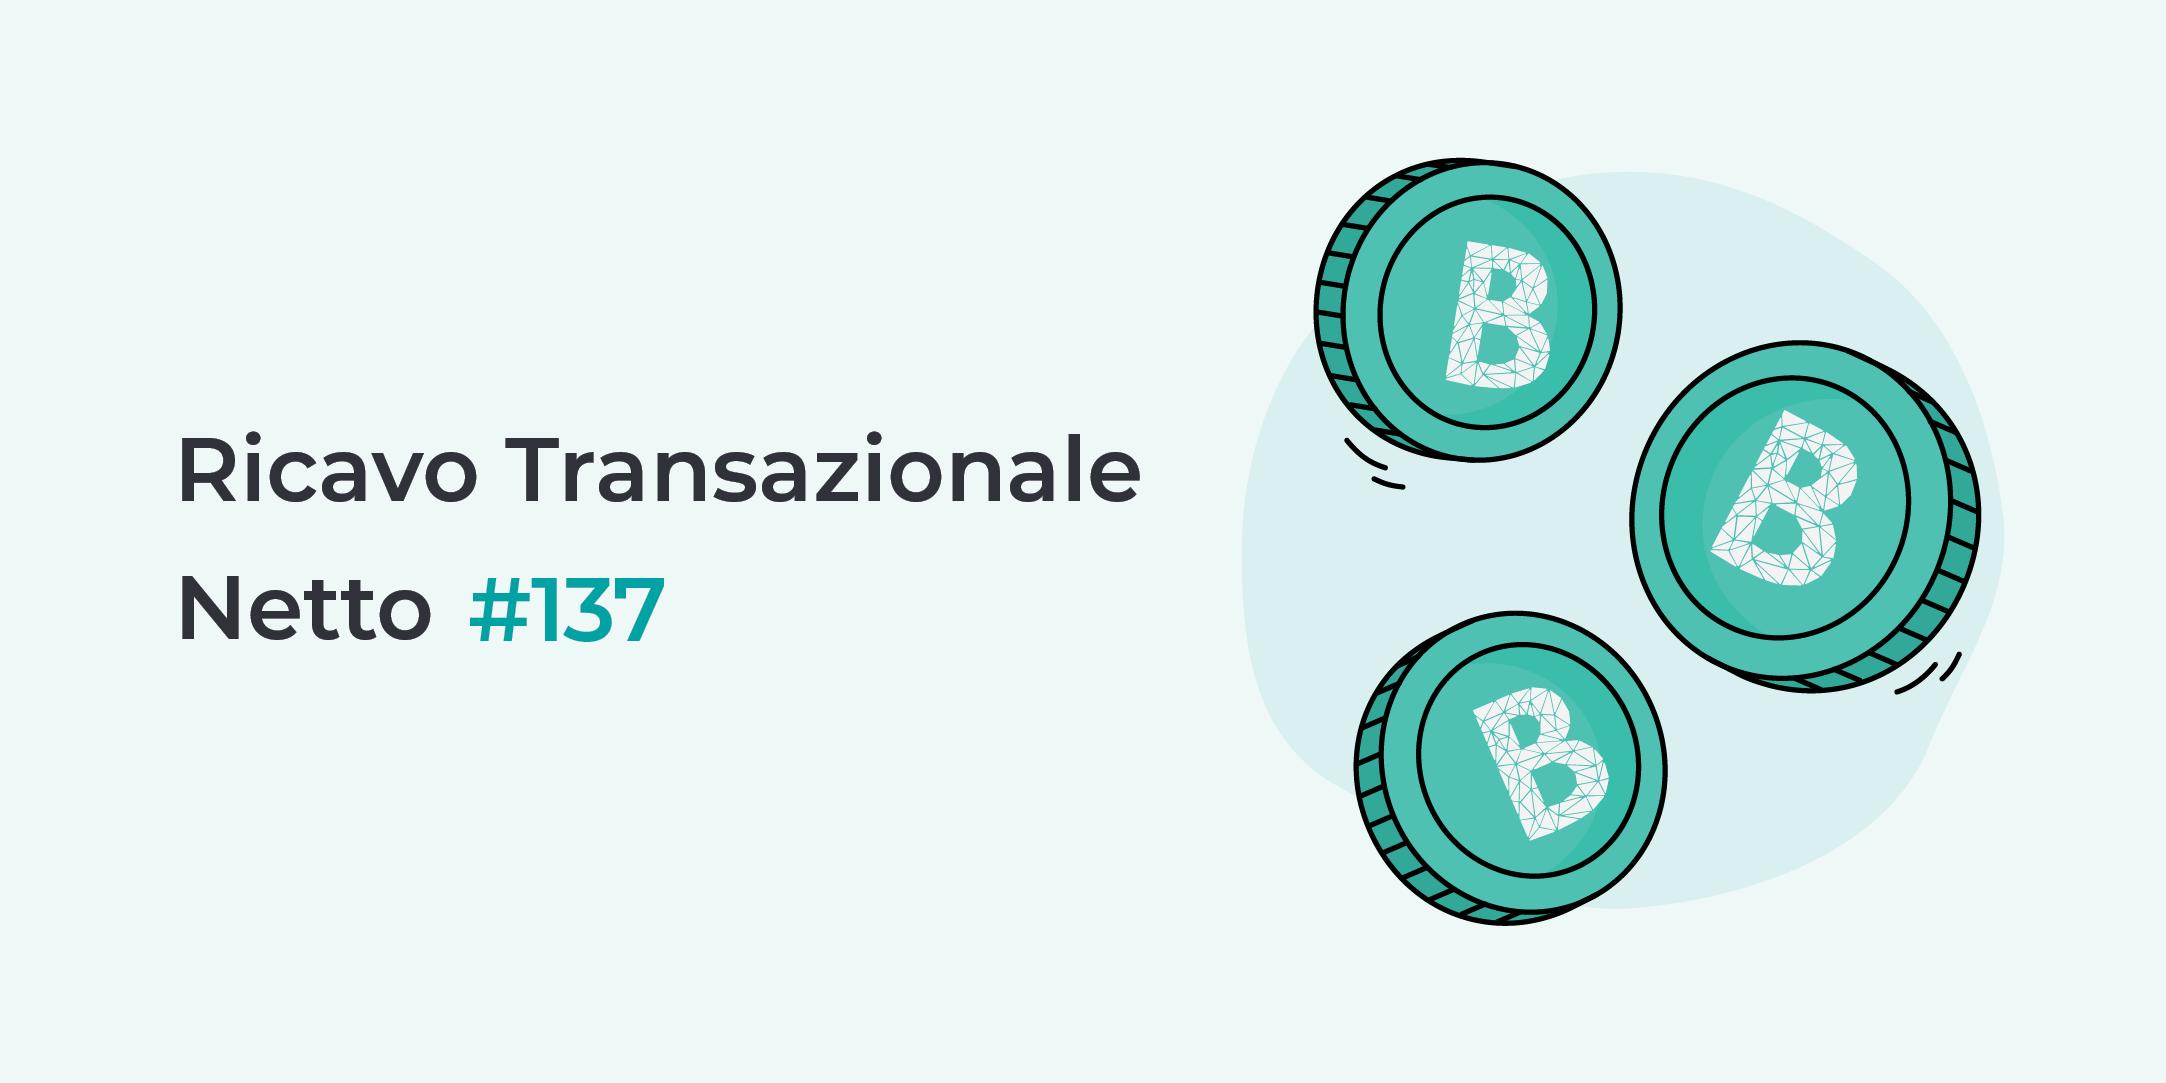 Net Transactional Revenue Number 137